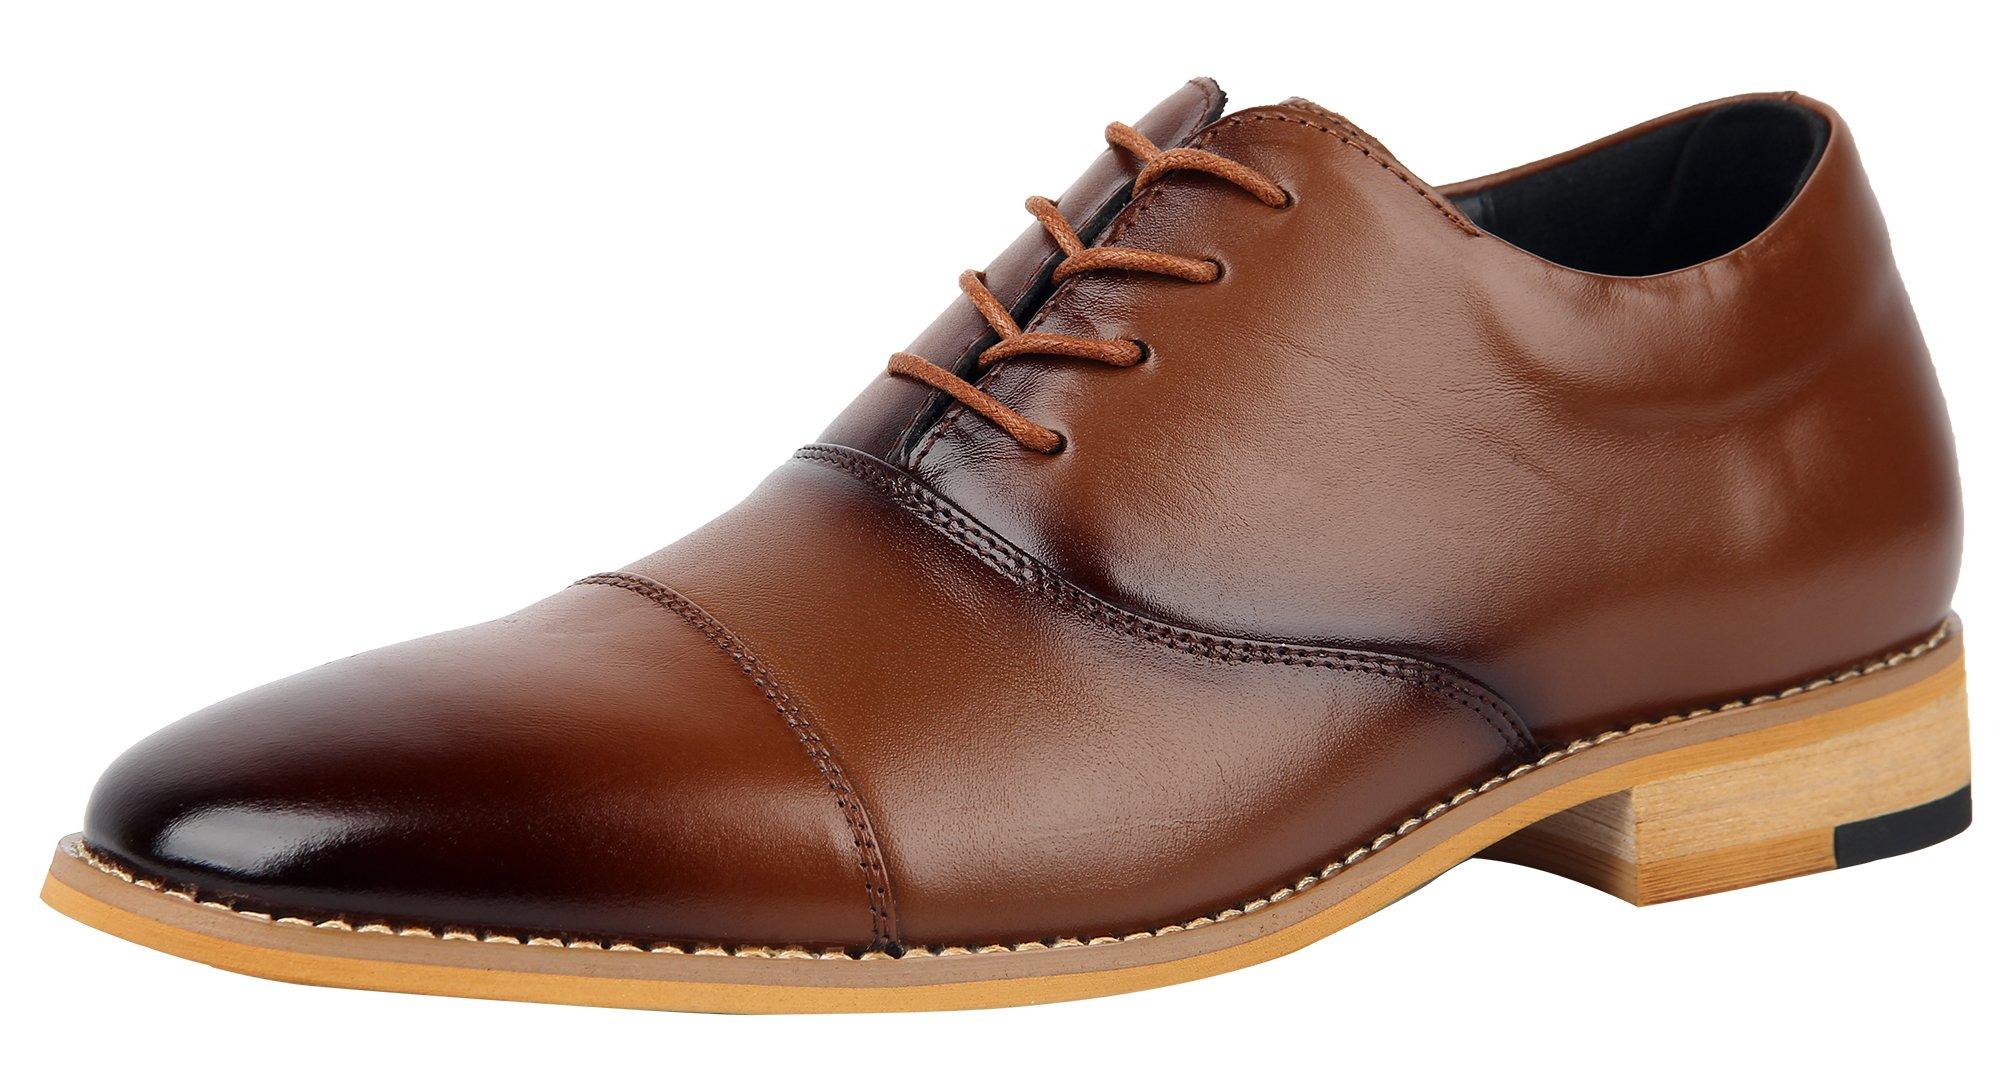 Men's Leather Cap-Toe Lace-up Oxford Shoe Brown US Size 14